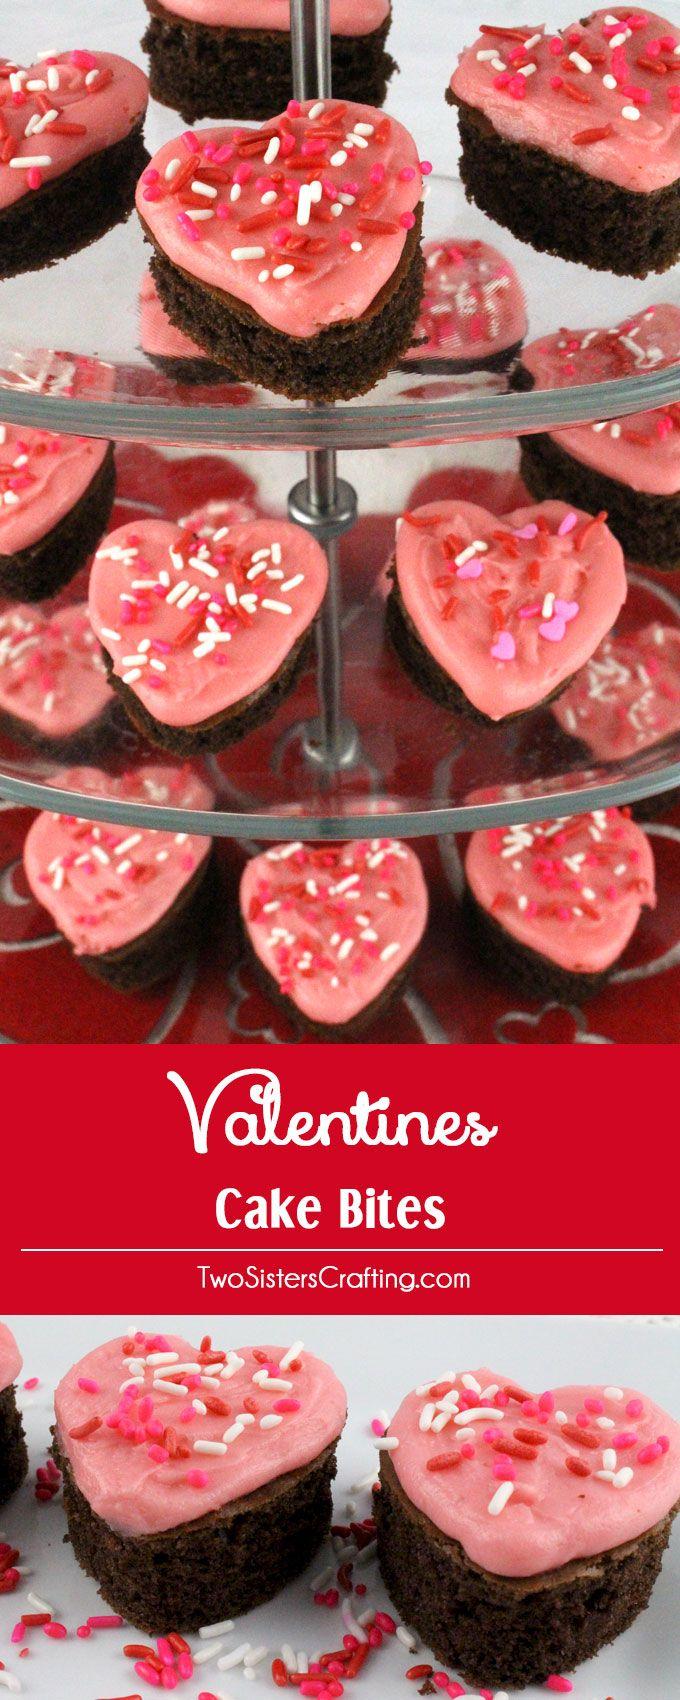 best 25+ valentines day cakes ideas on pinterest   valentines day